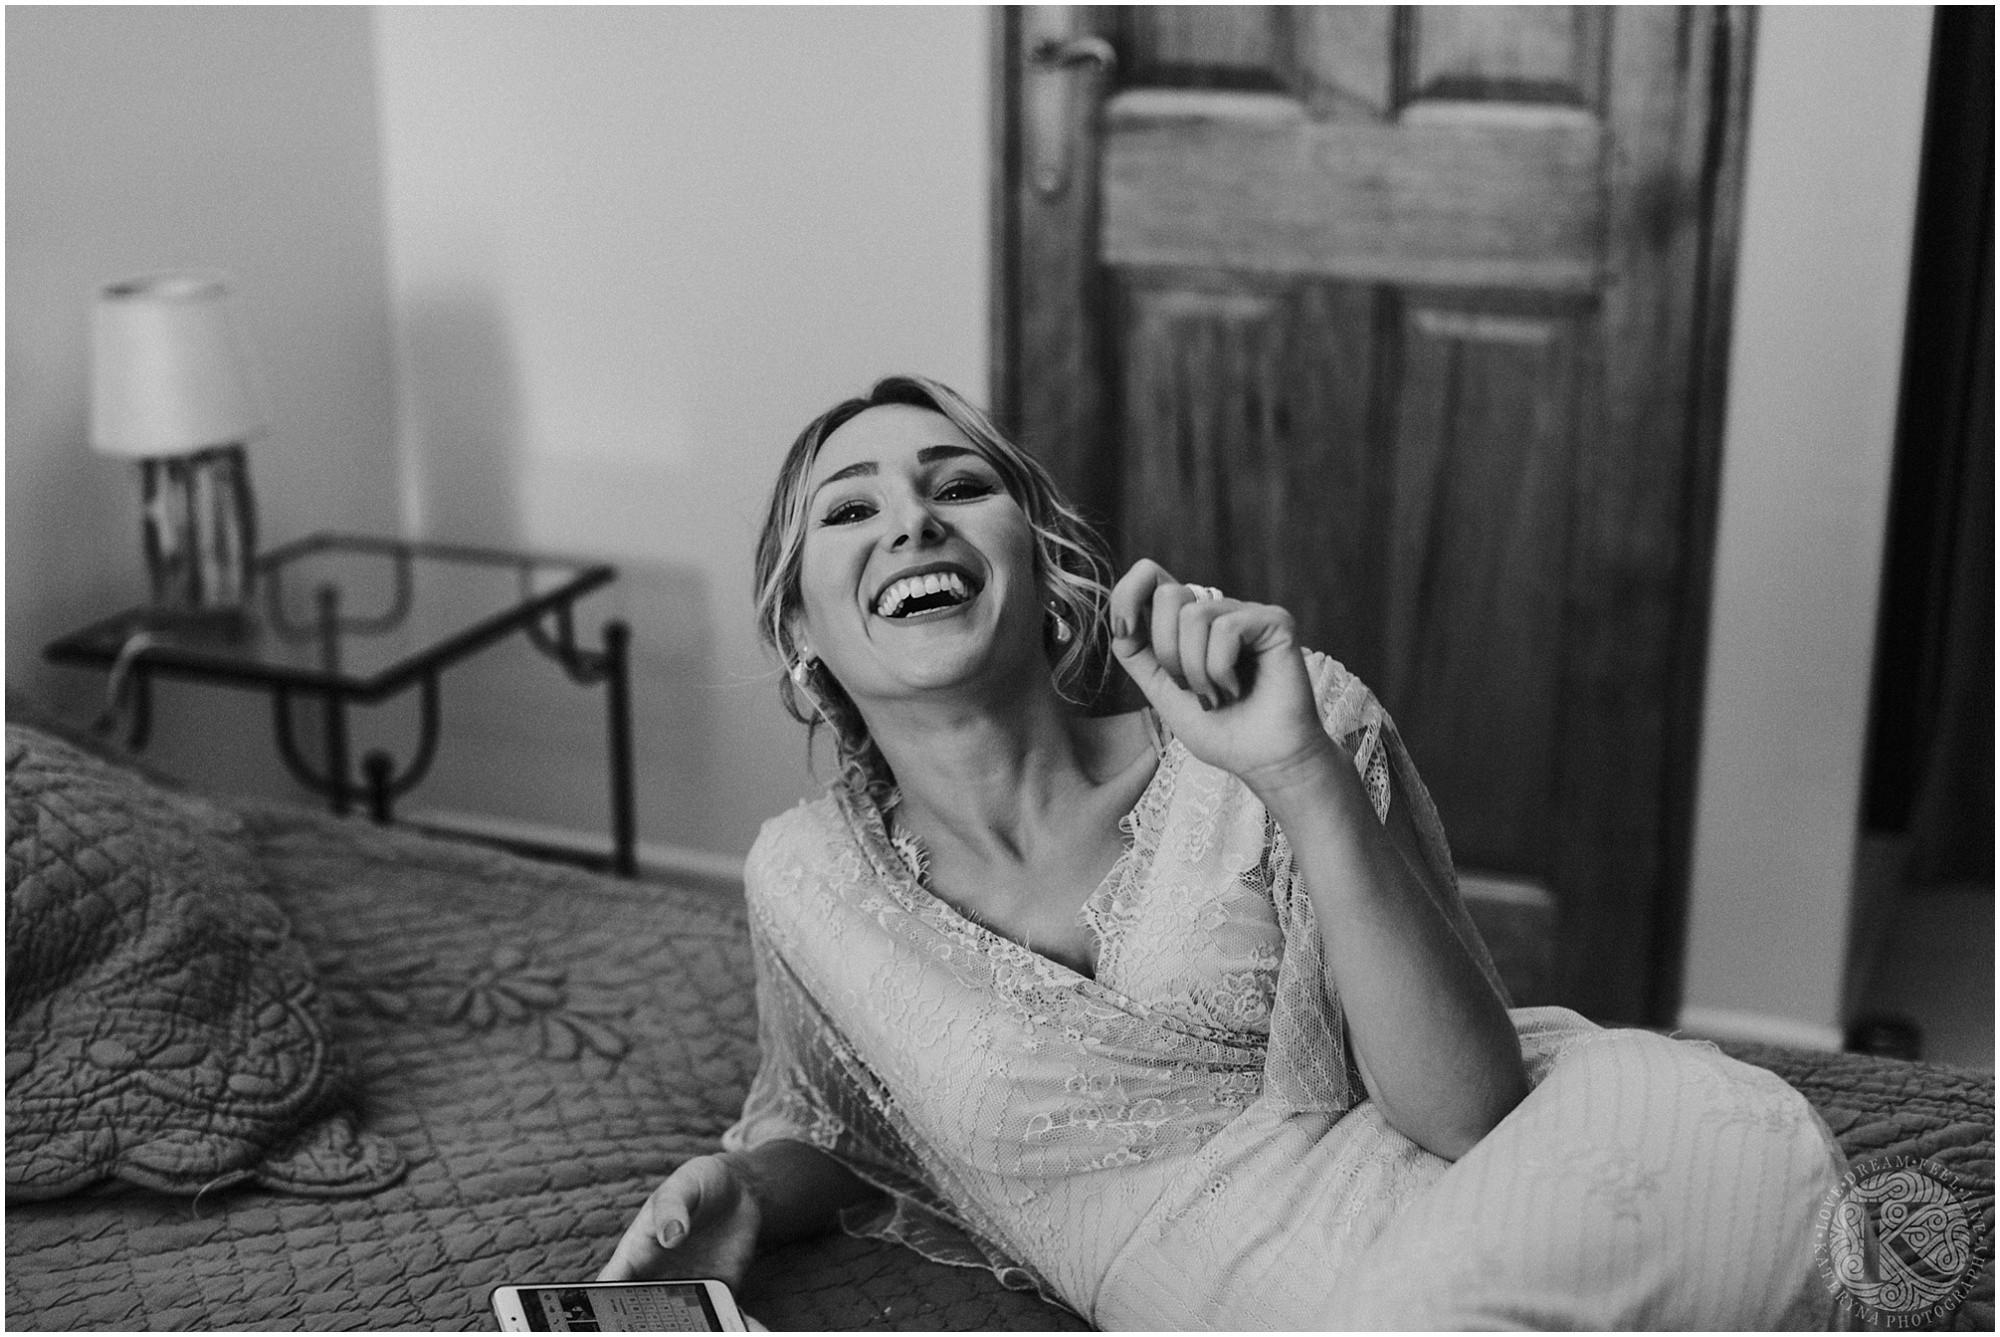 Kateryna-photos-photographe-mariage-vaucluse-provence-avignon-ferme-st-hugues_0022.jpg